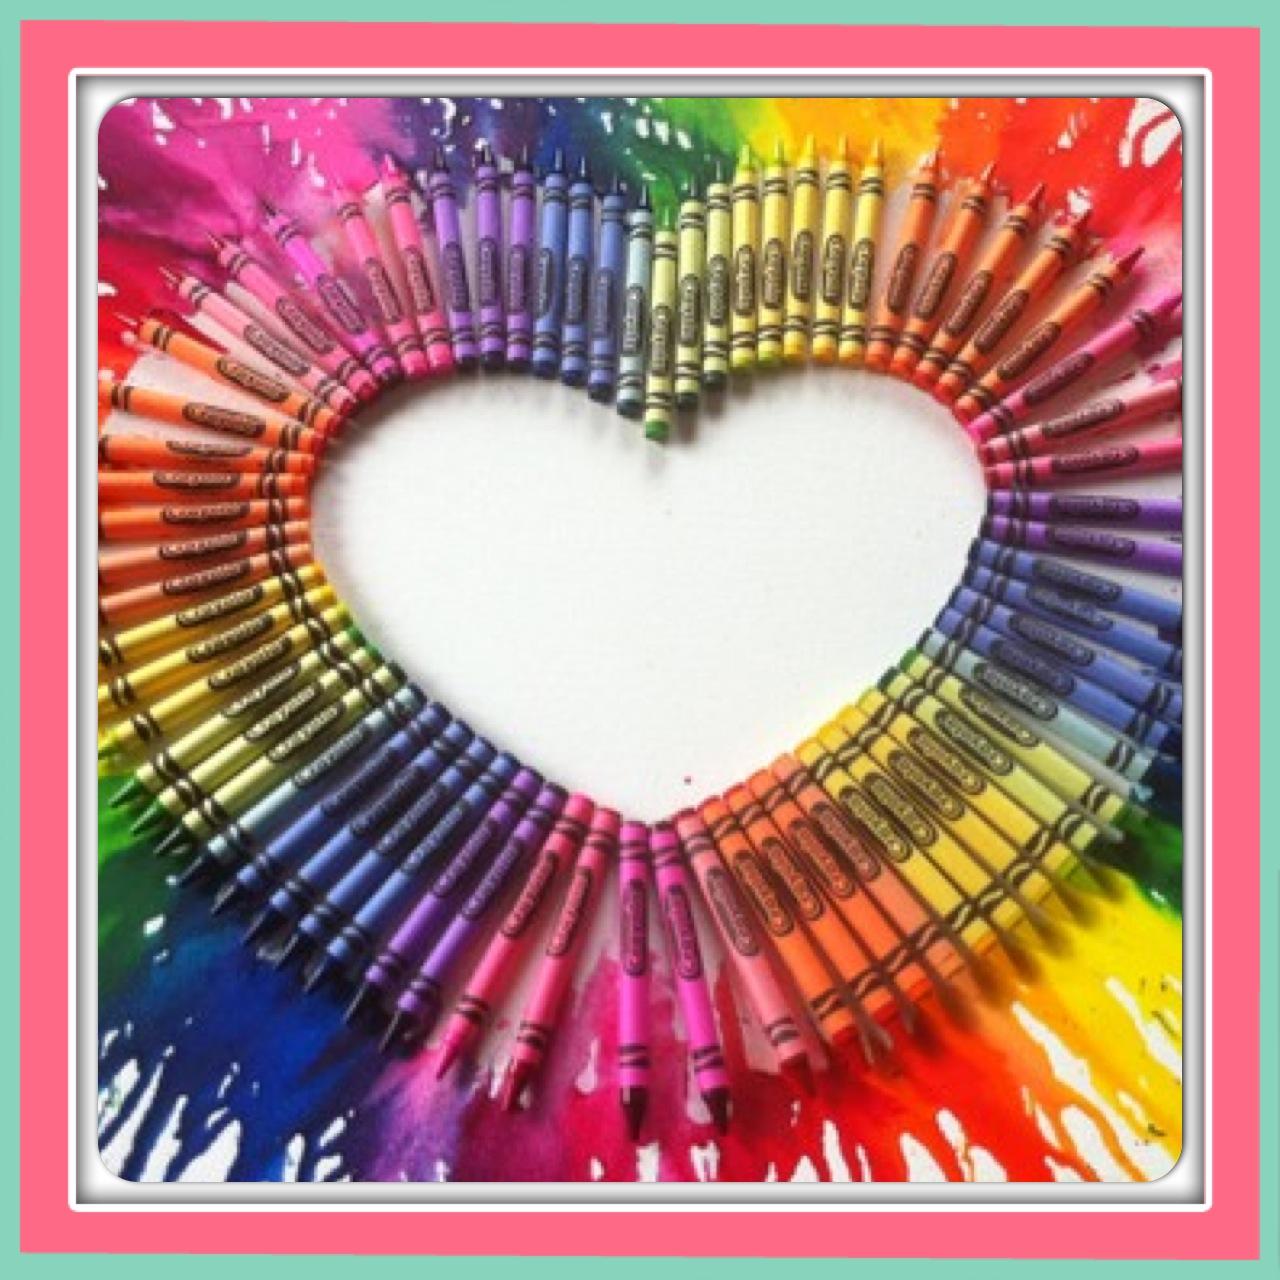 crayon artwork heart shaped